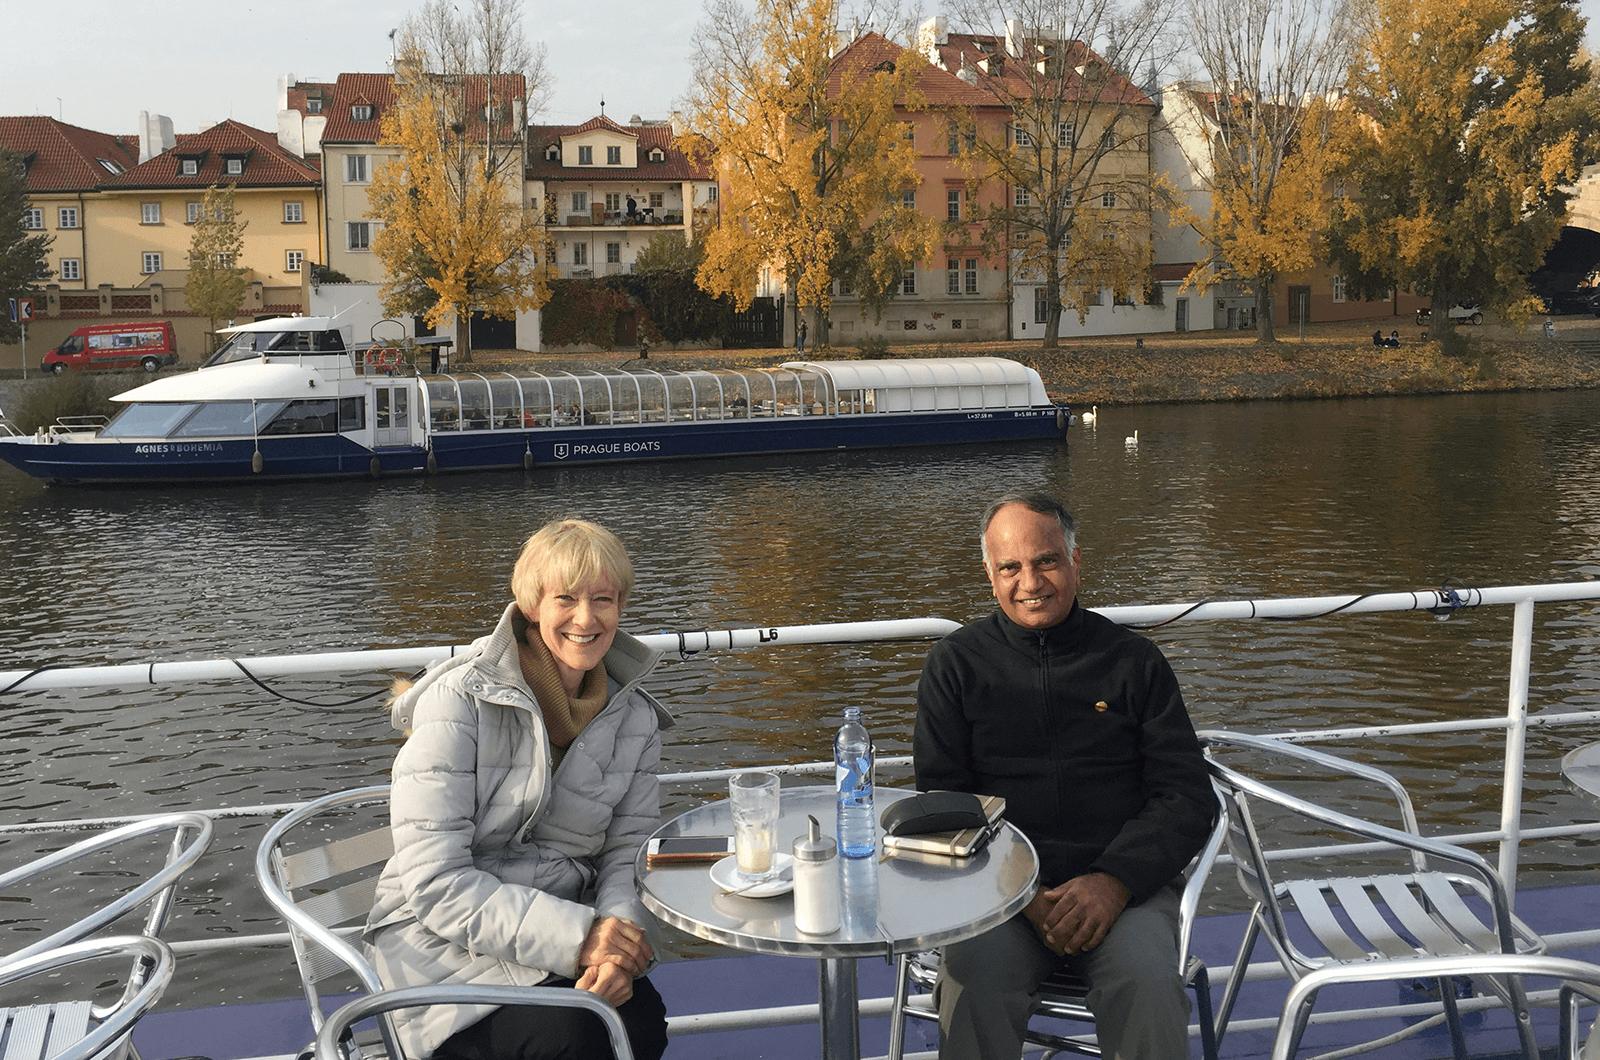 Immediate Past International President Lark Doley, left, and new International President Deepak Menon enjoy a conversation while in Prague.